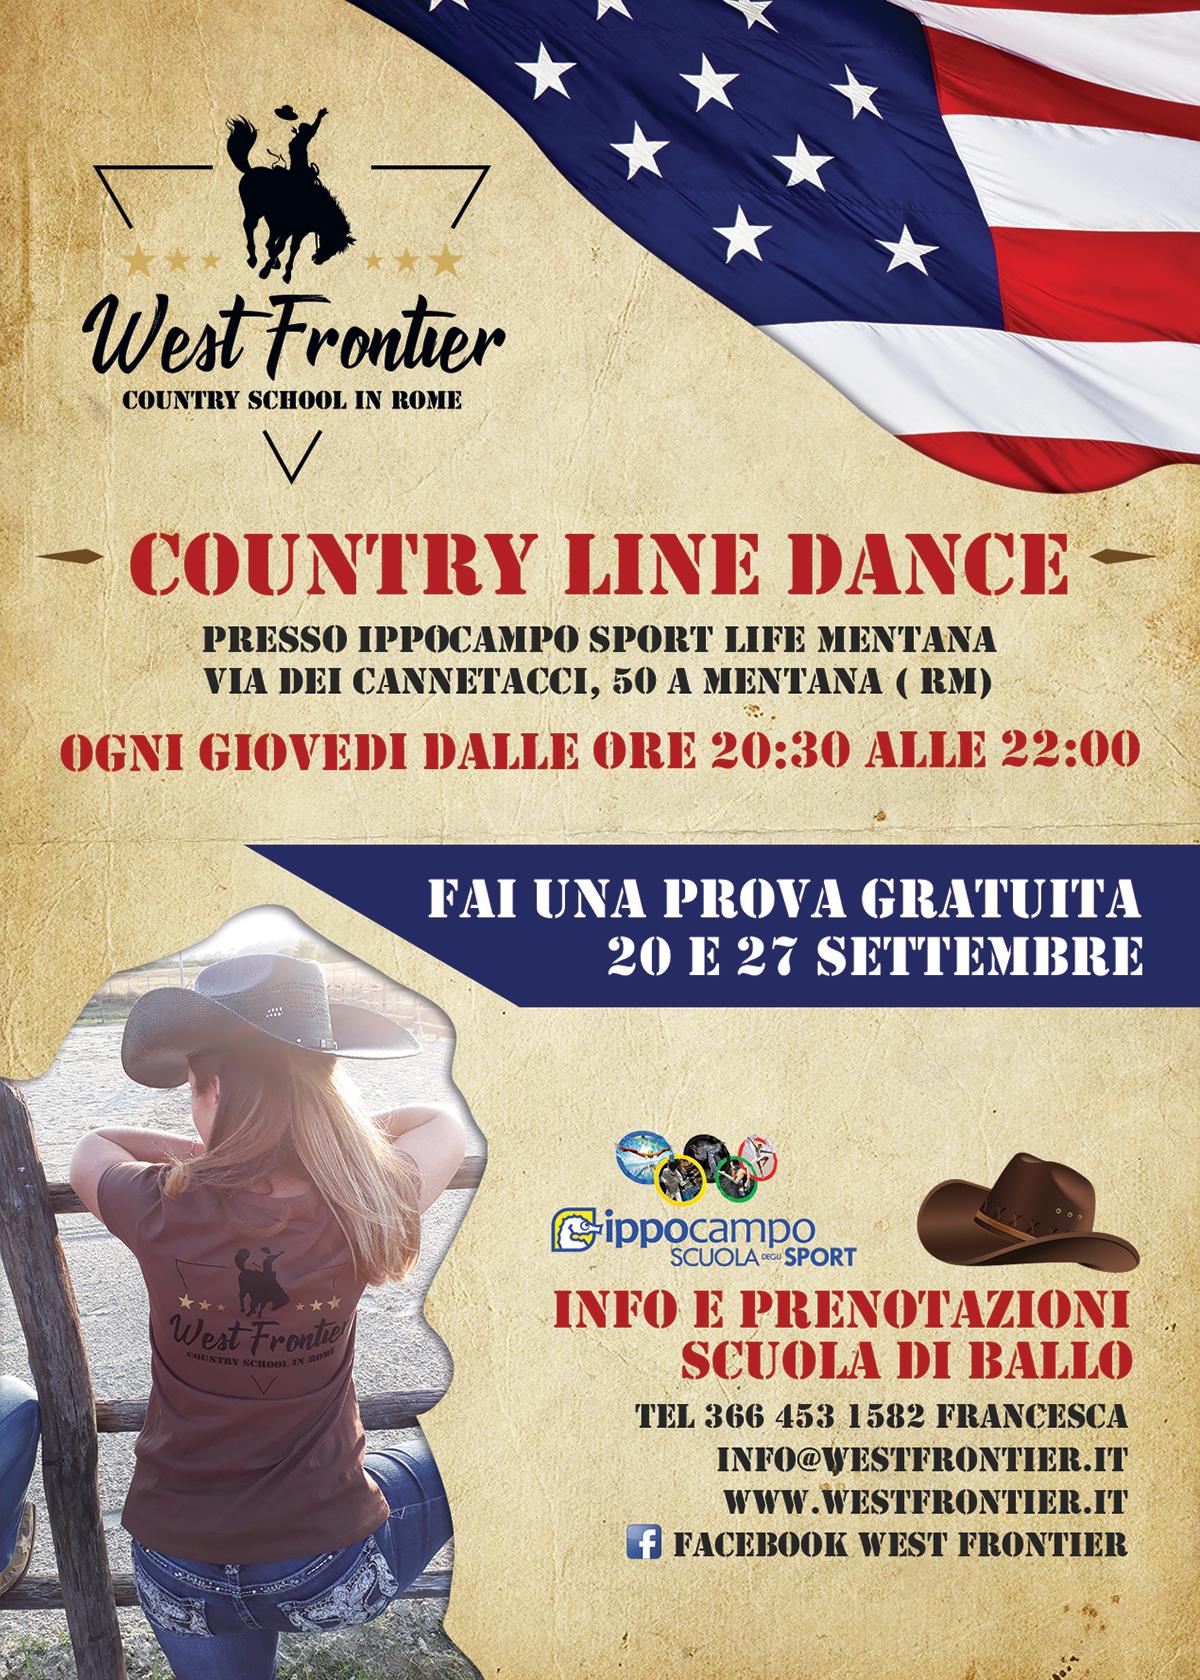 Corso Principianti Country Line Dance